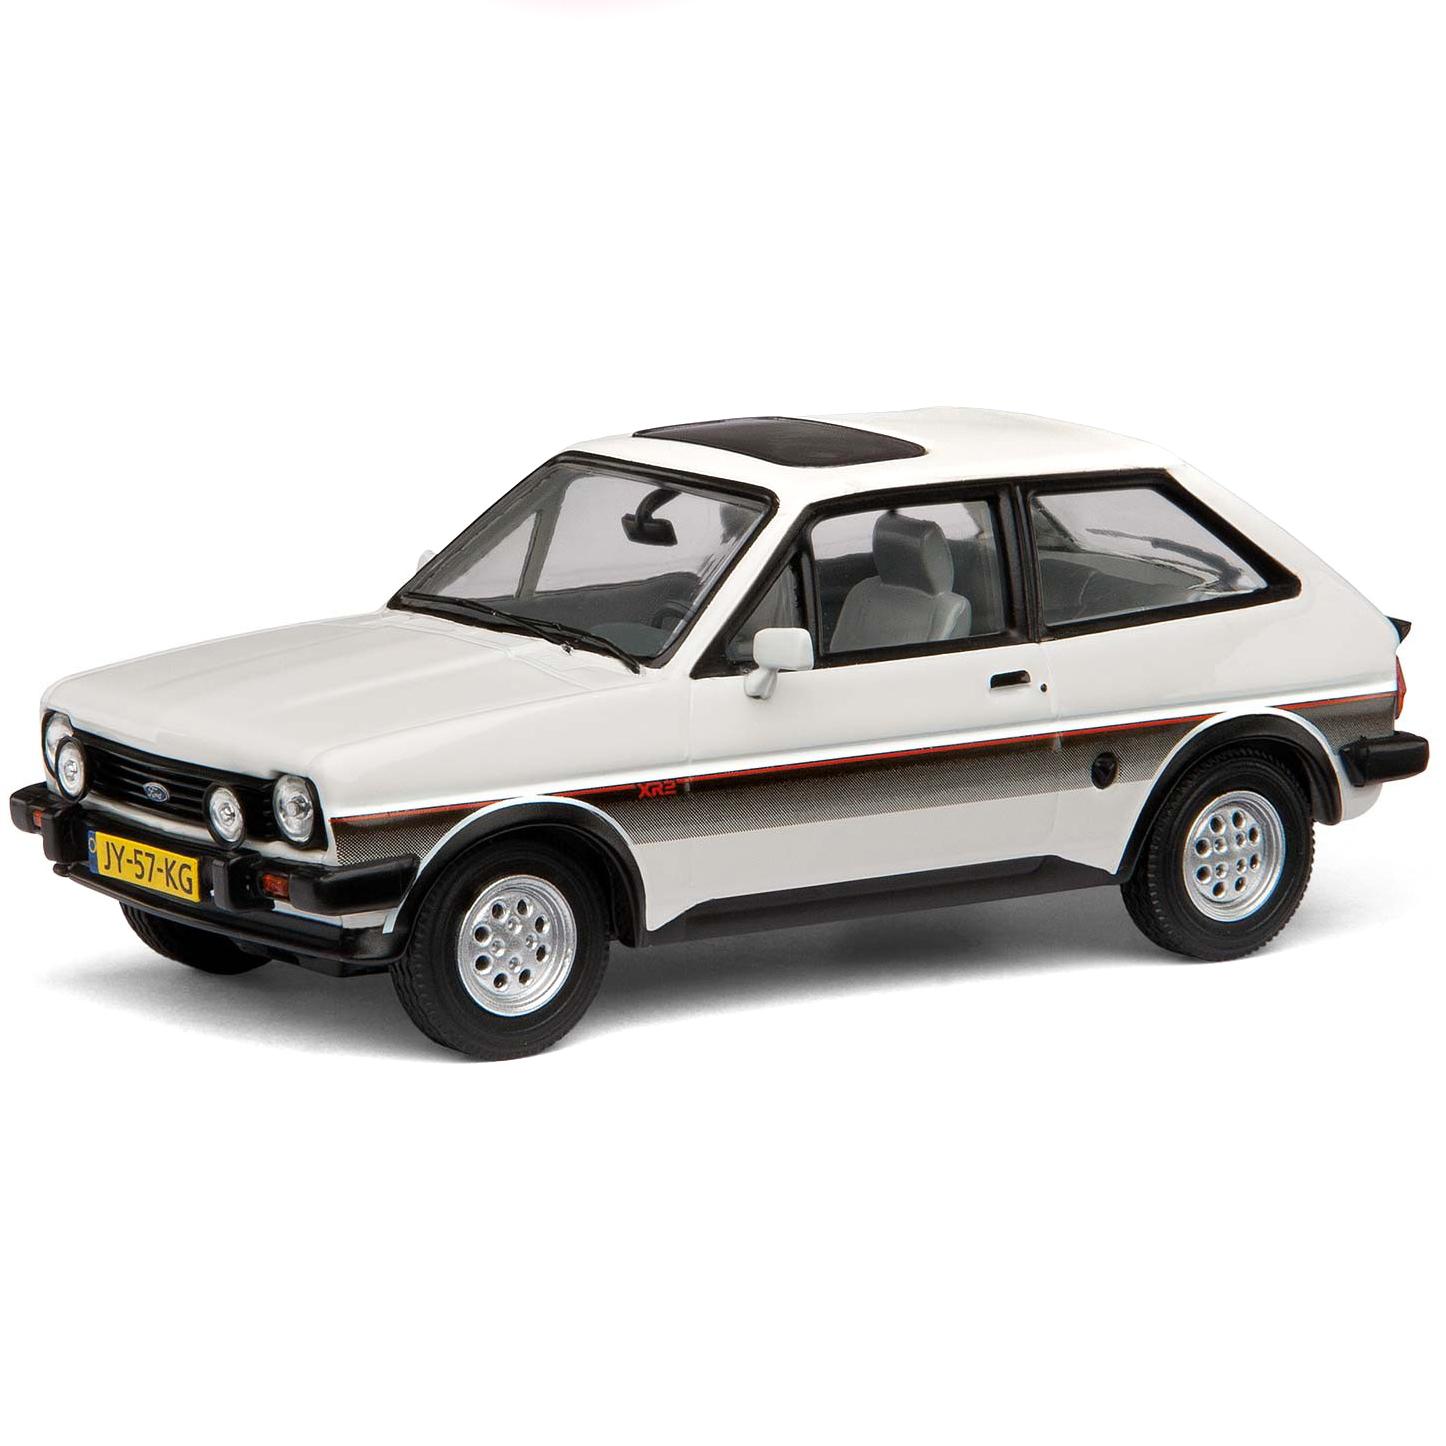 Ford Fiesta Mk1 & Mk2 1976-1989